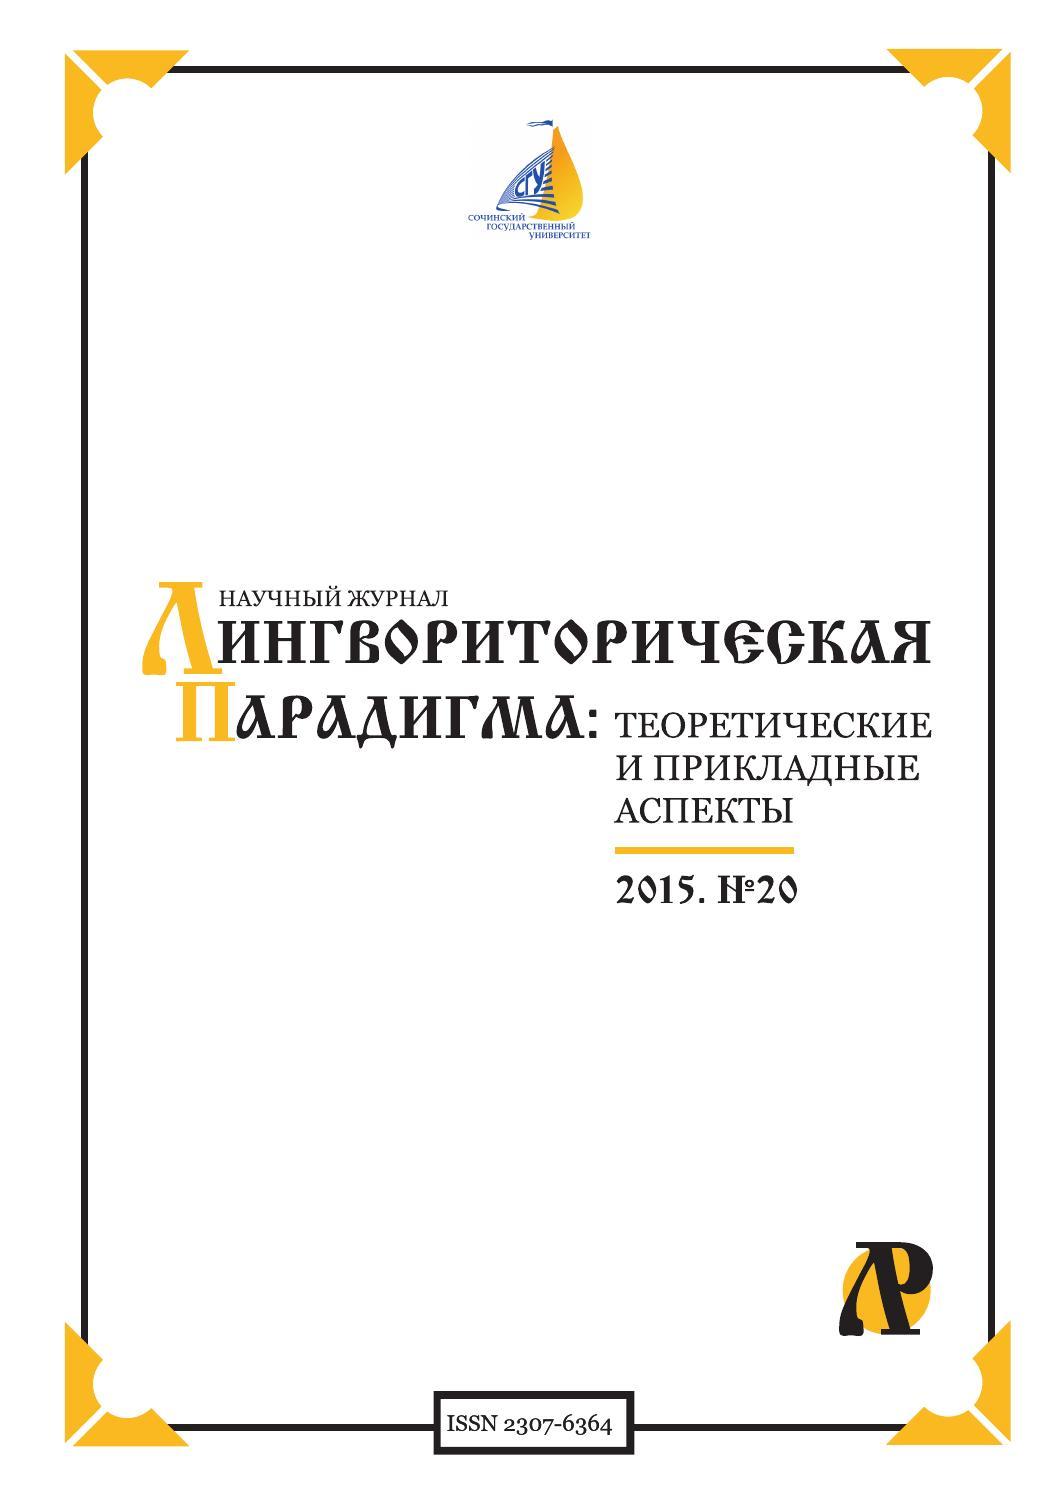 45b3058783f6 Лингвориторическая парадигма  теоретические и прикладные аспекты 2015 №20  by Oleg Skulkin - issuu